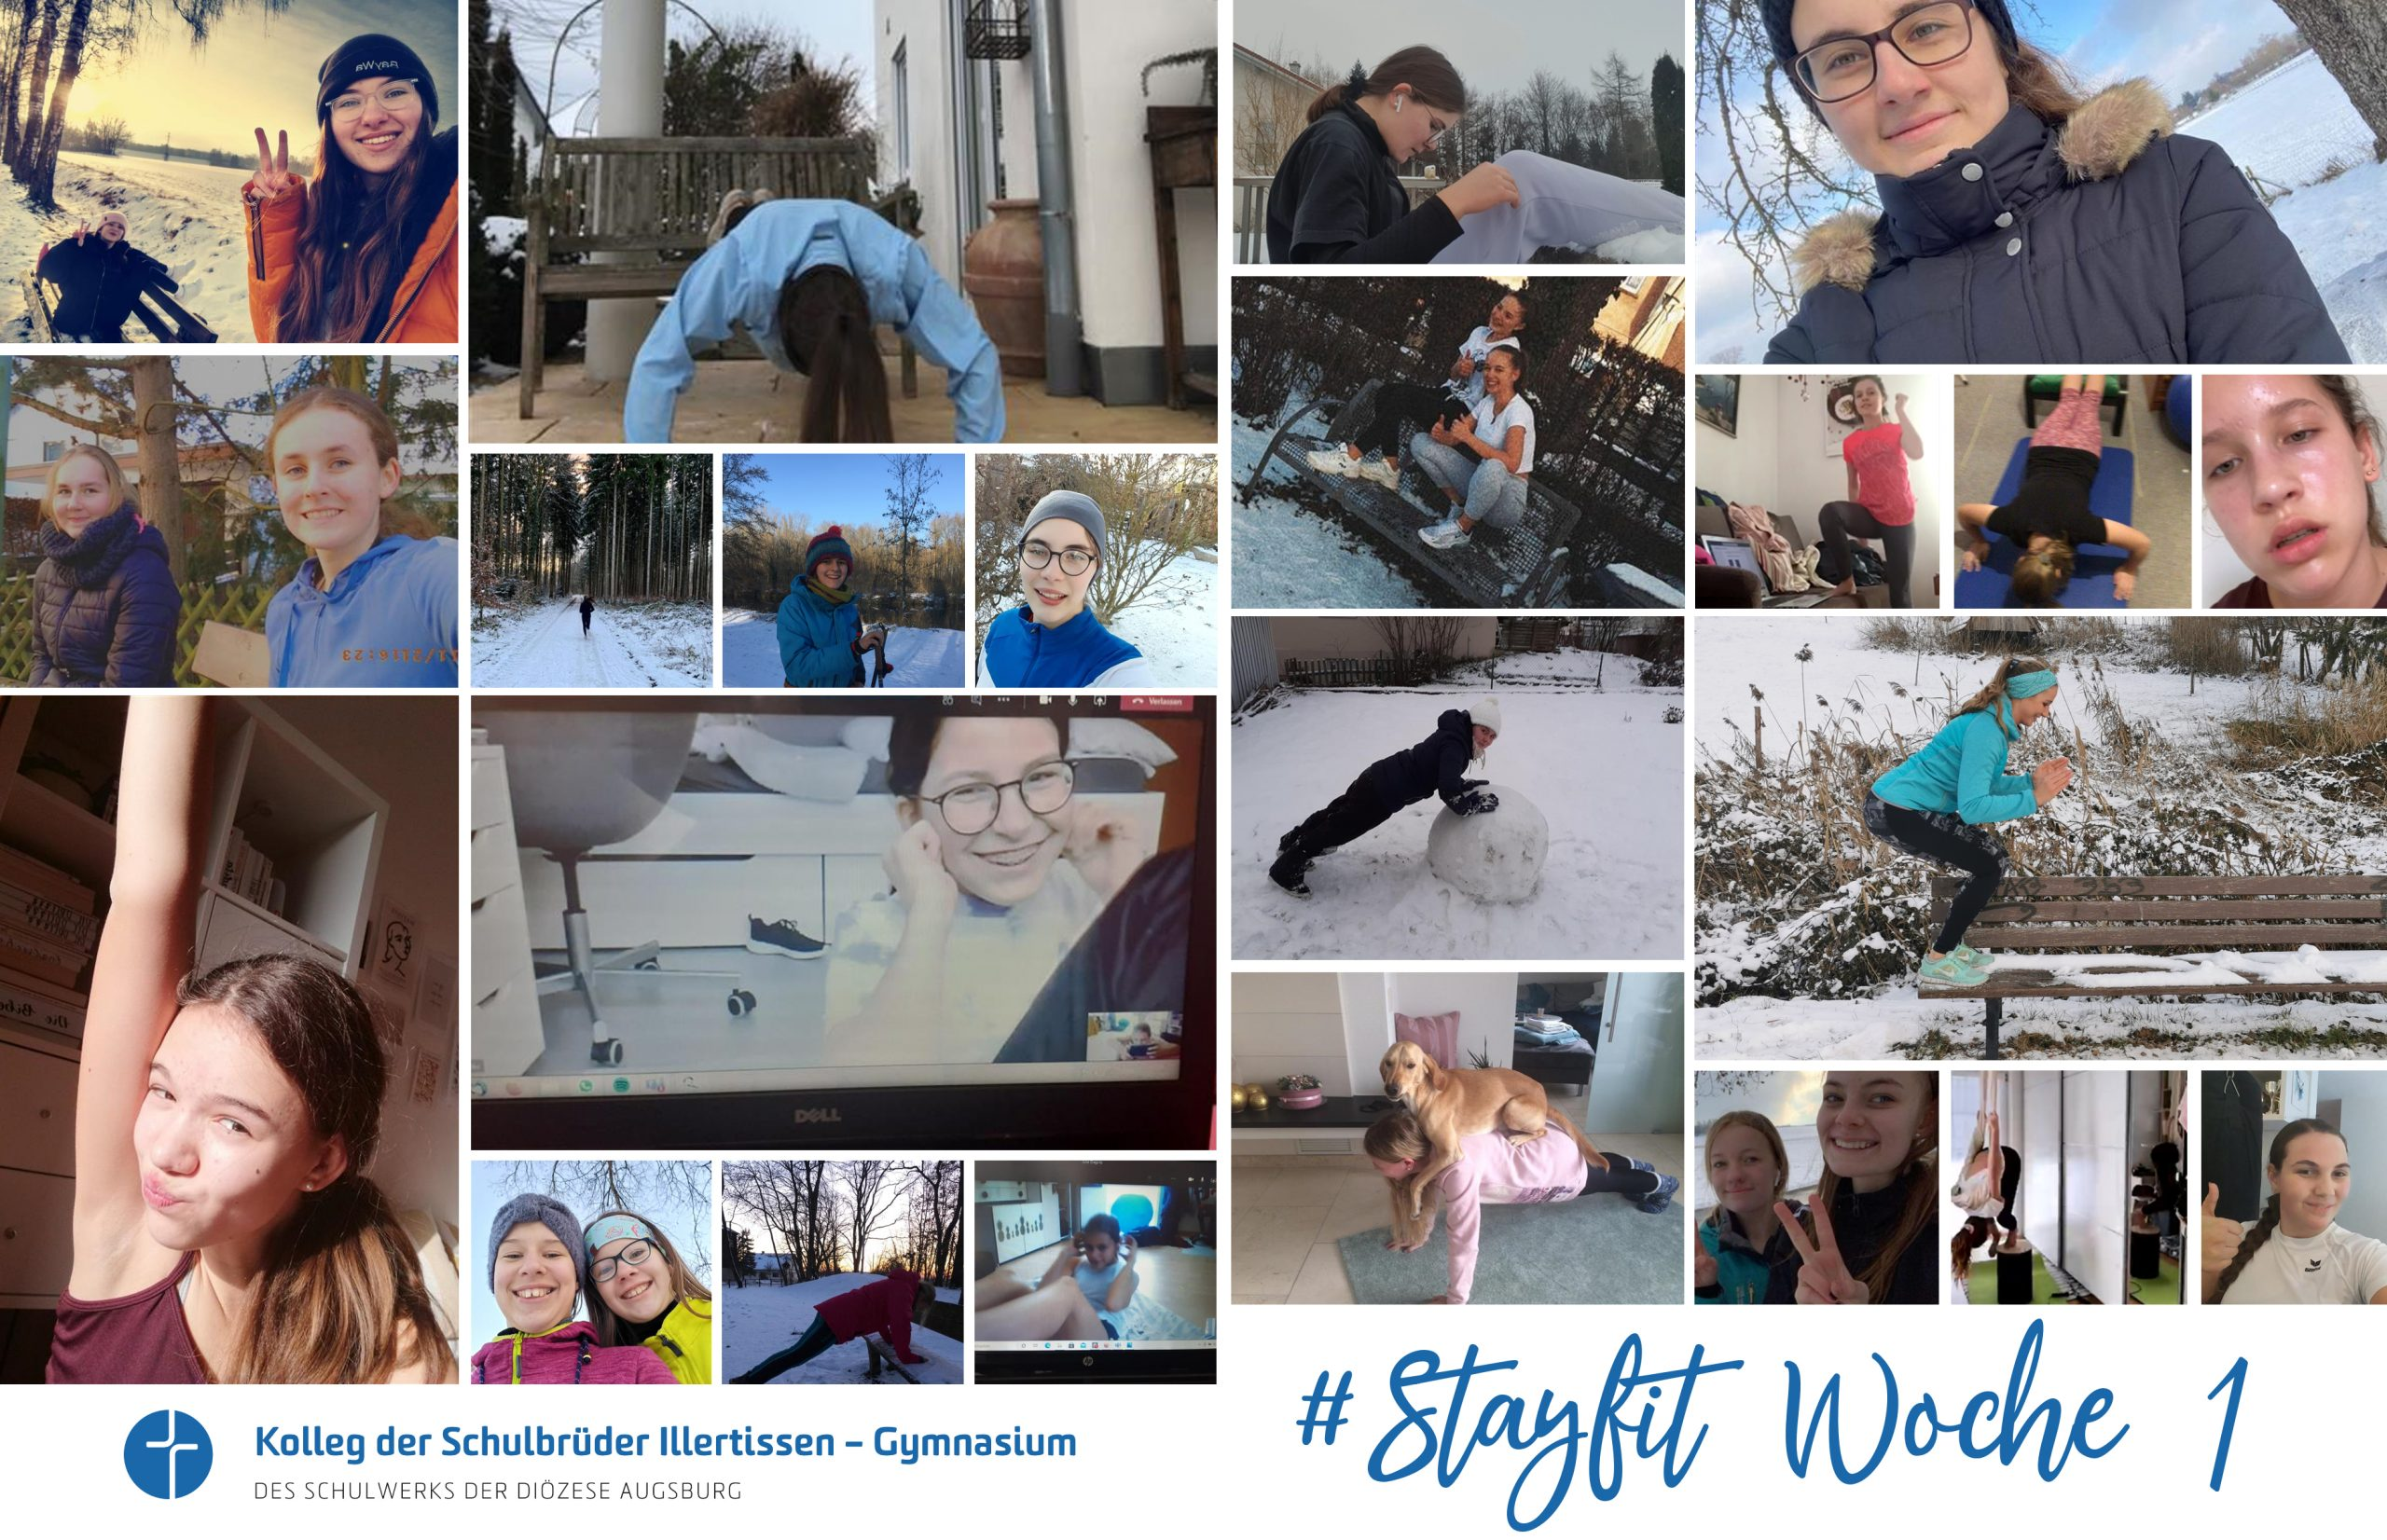 #stayfit Woche 1